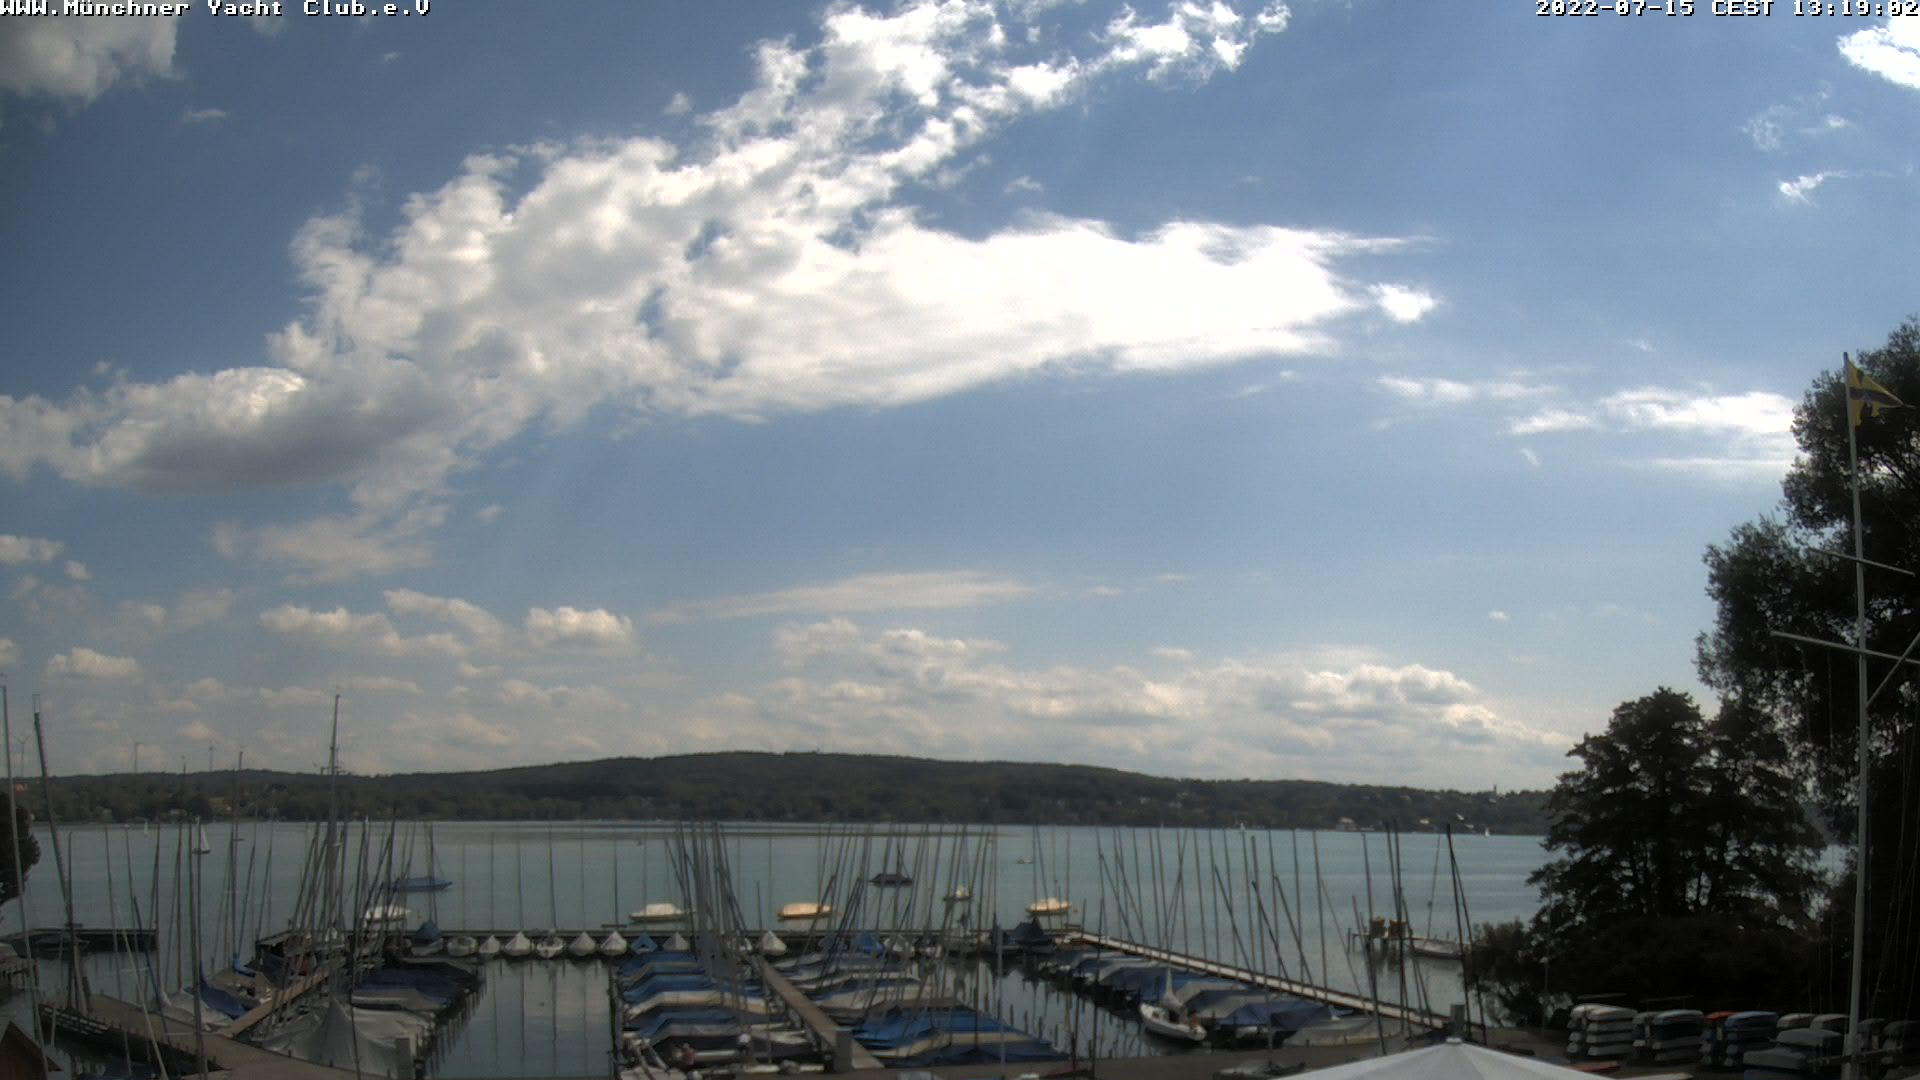 Webcam Münchner Yacht-Club, Starnberg